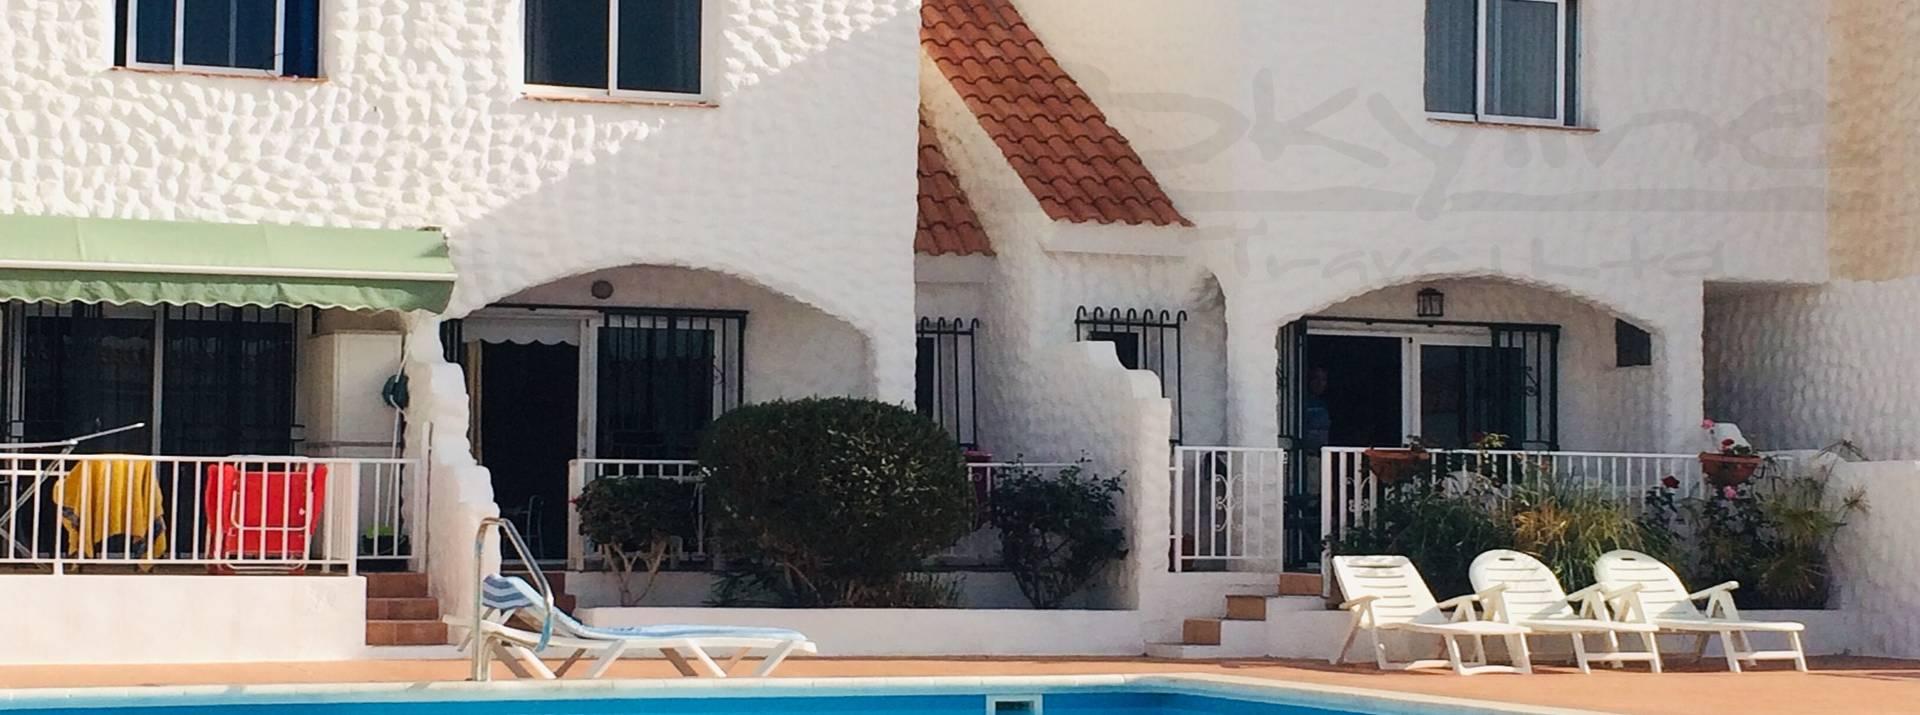 paloblanoc-apartment-pool.jpeg